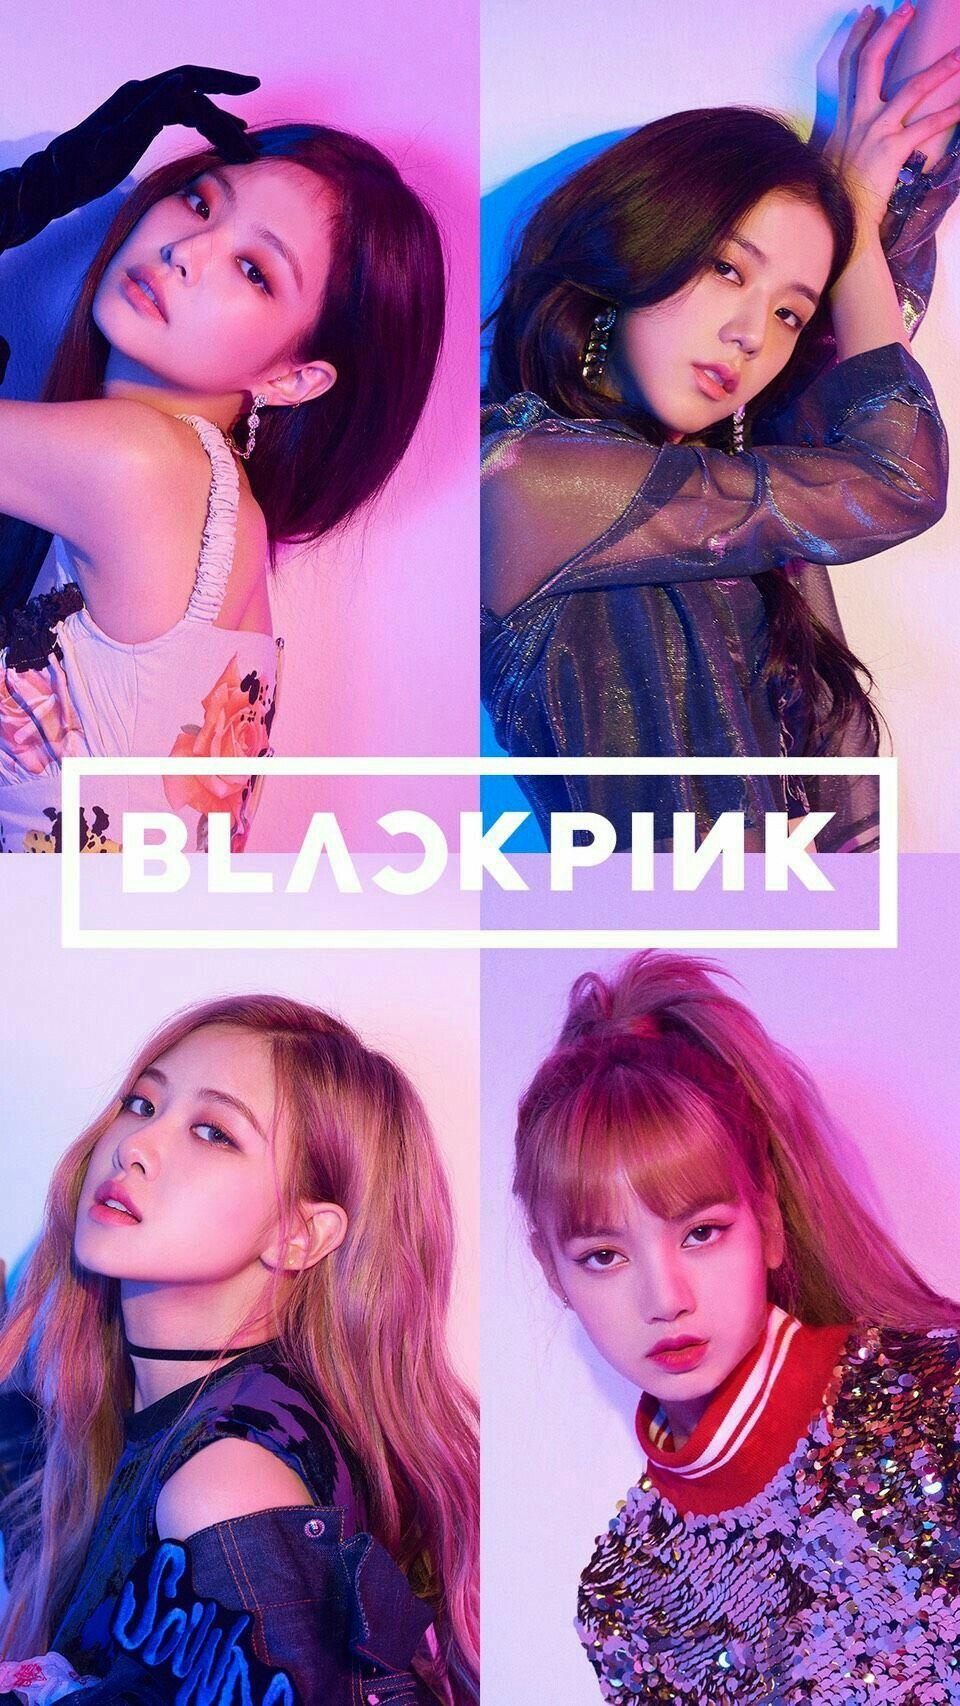 Bllɔkpiik Wallpaper Black Pink Kpop Blackpink Blackpink Fashion